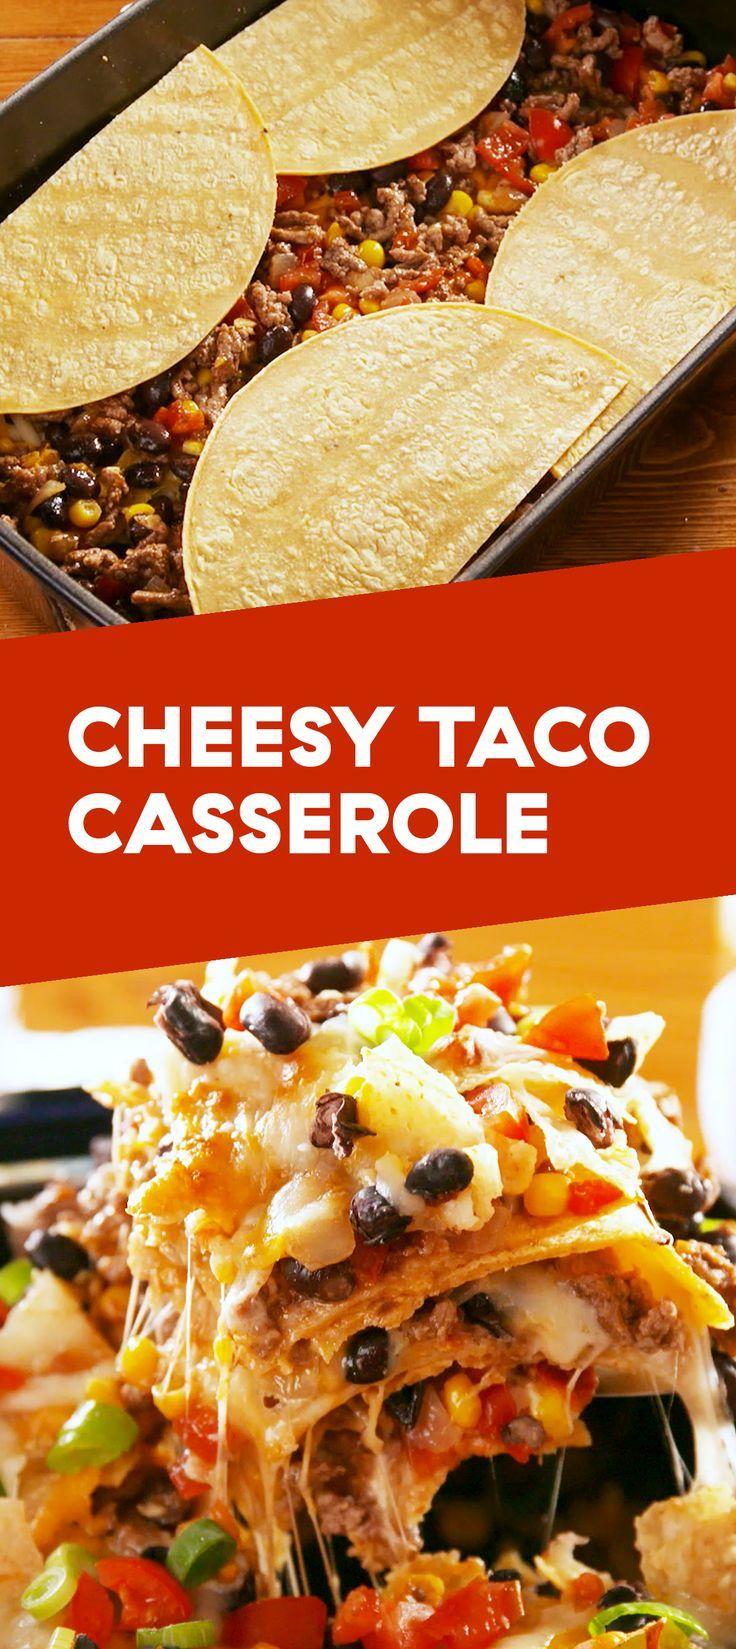 Cheesy Taco Casserole images